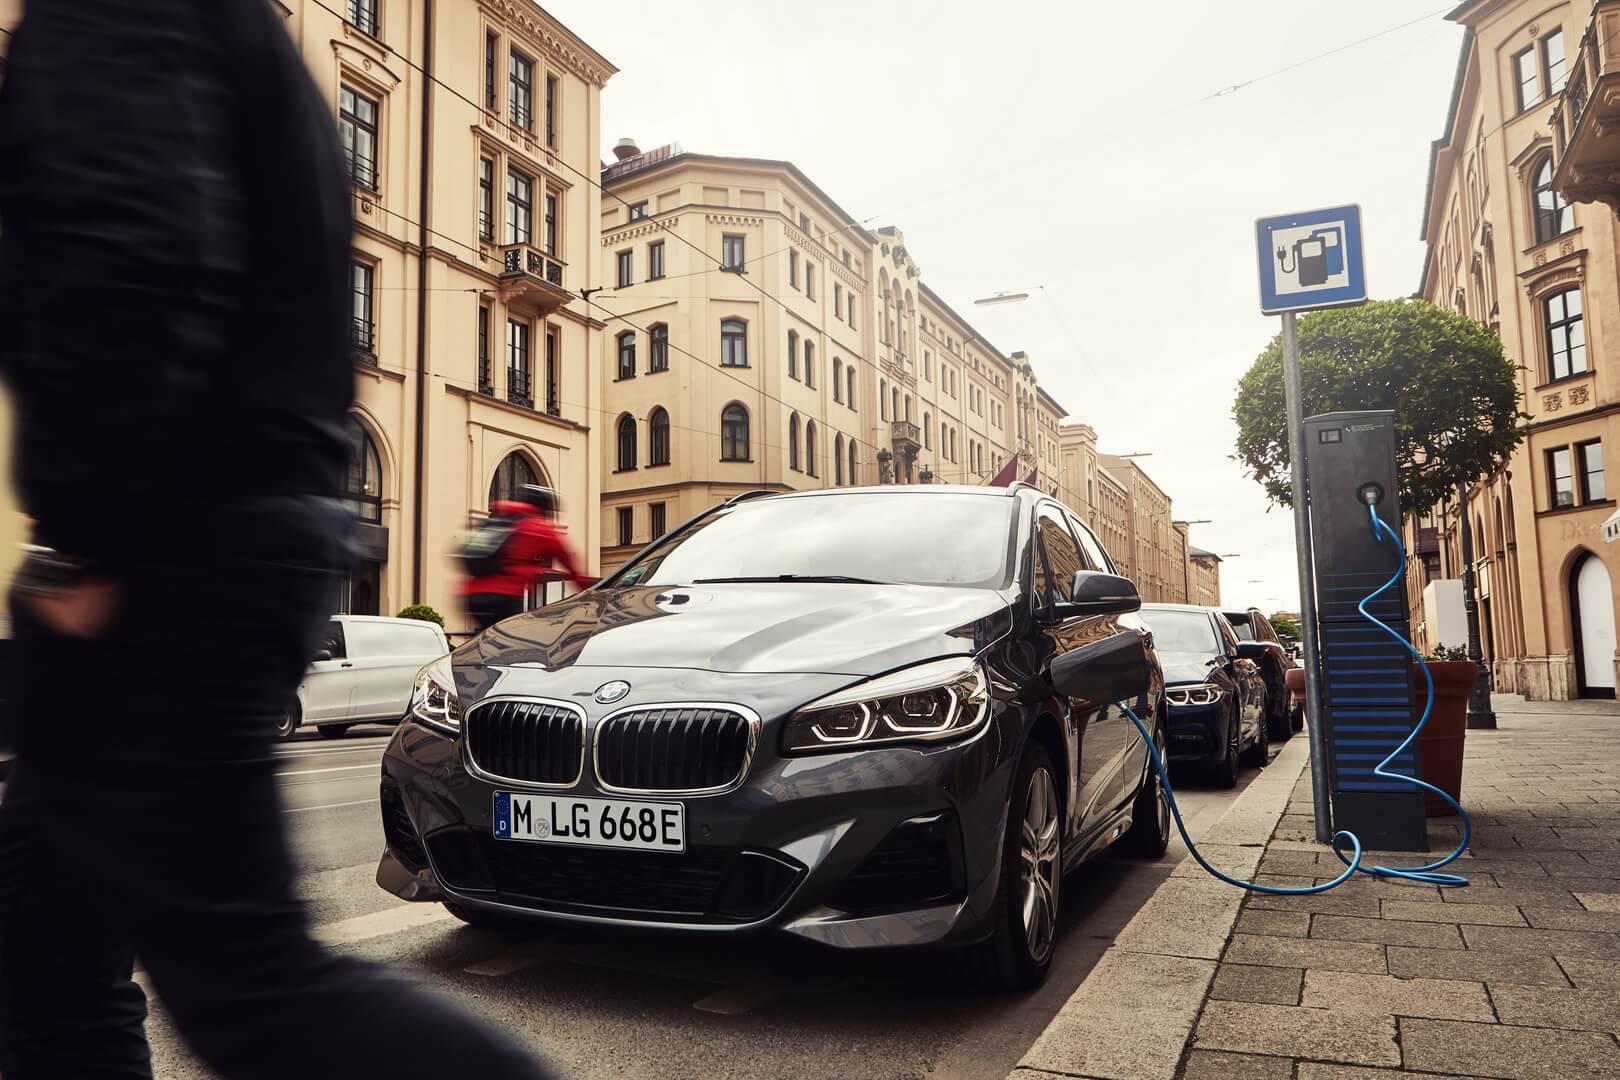 BMW 225xe Active Tourer получит увеличение запаса хода на чистой электротяге до 53 км © press.bmwgroup.com